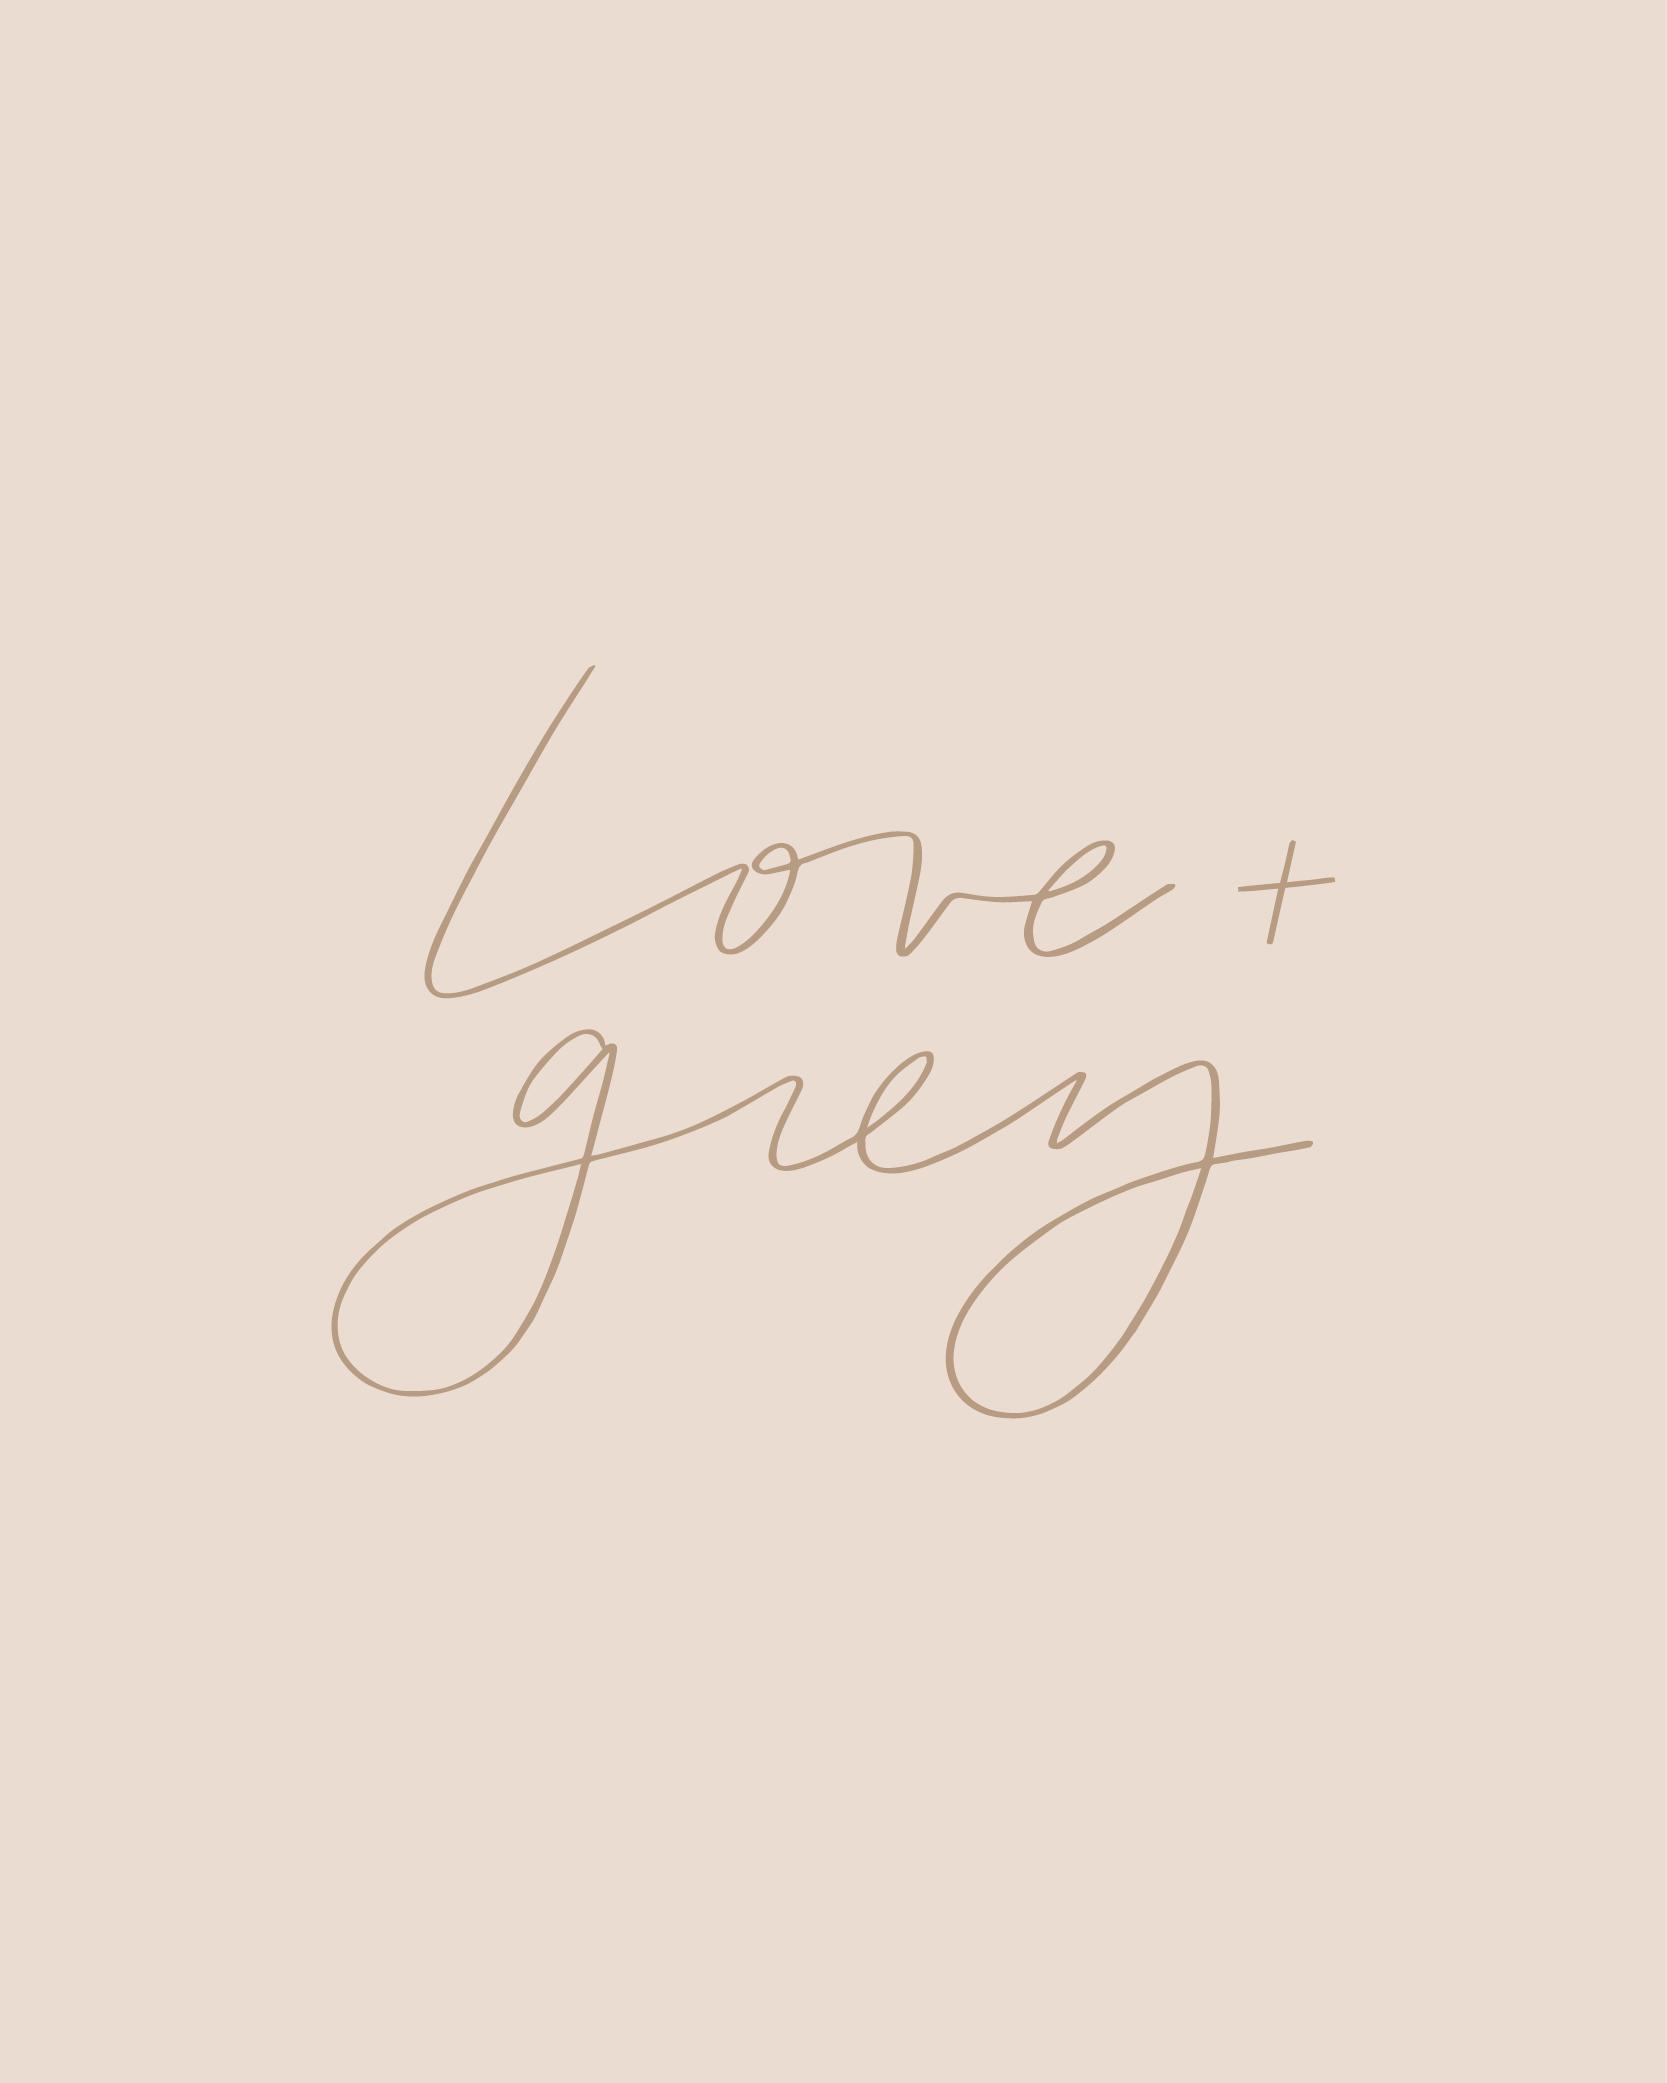 love-grey-etsy-wholesale-signs-branding-beachy-boho6.png